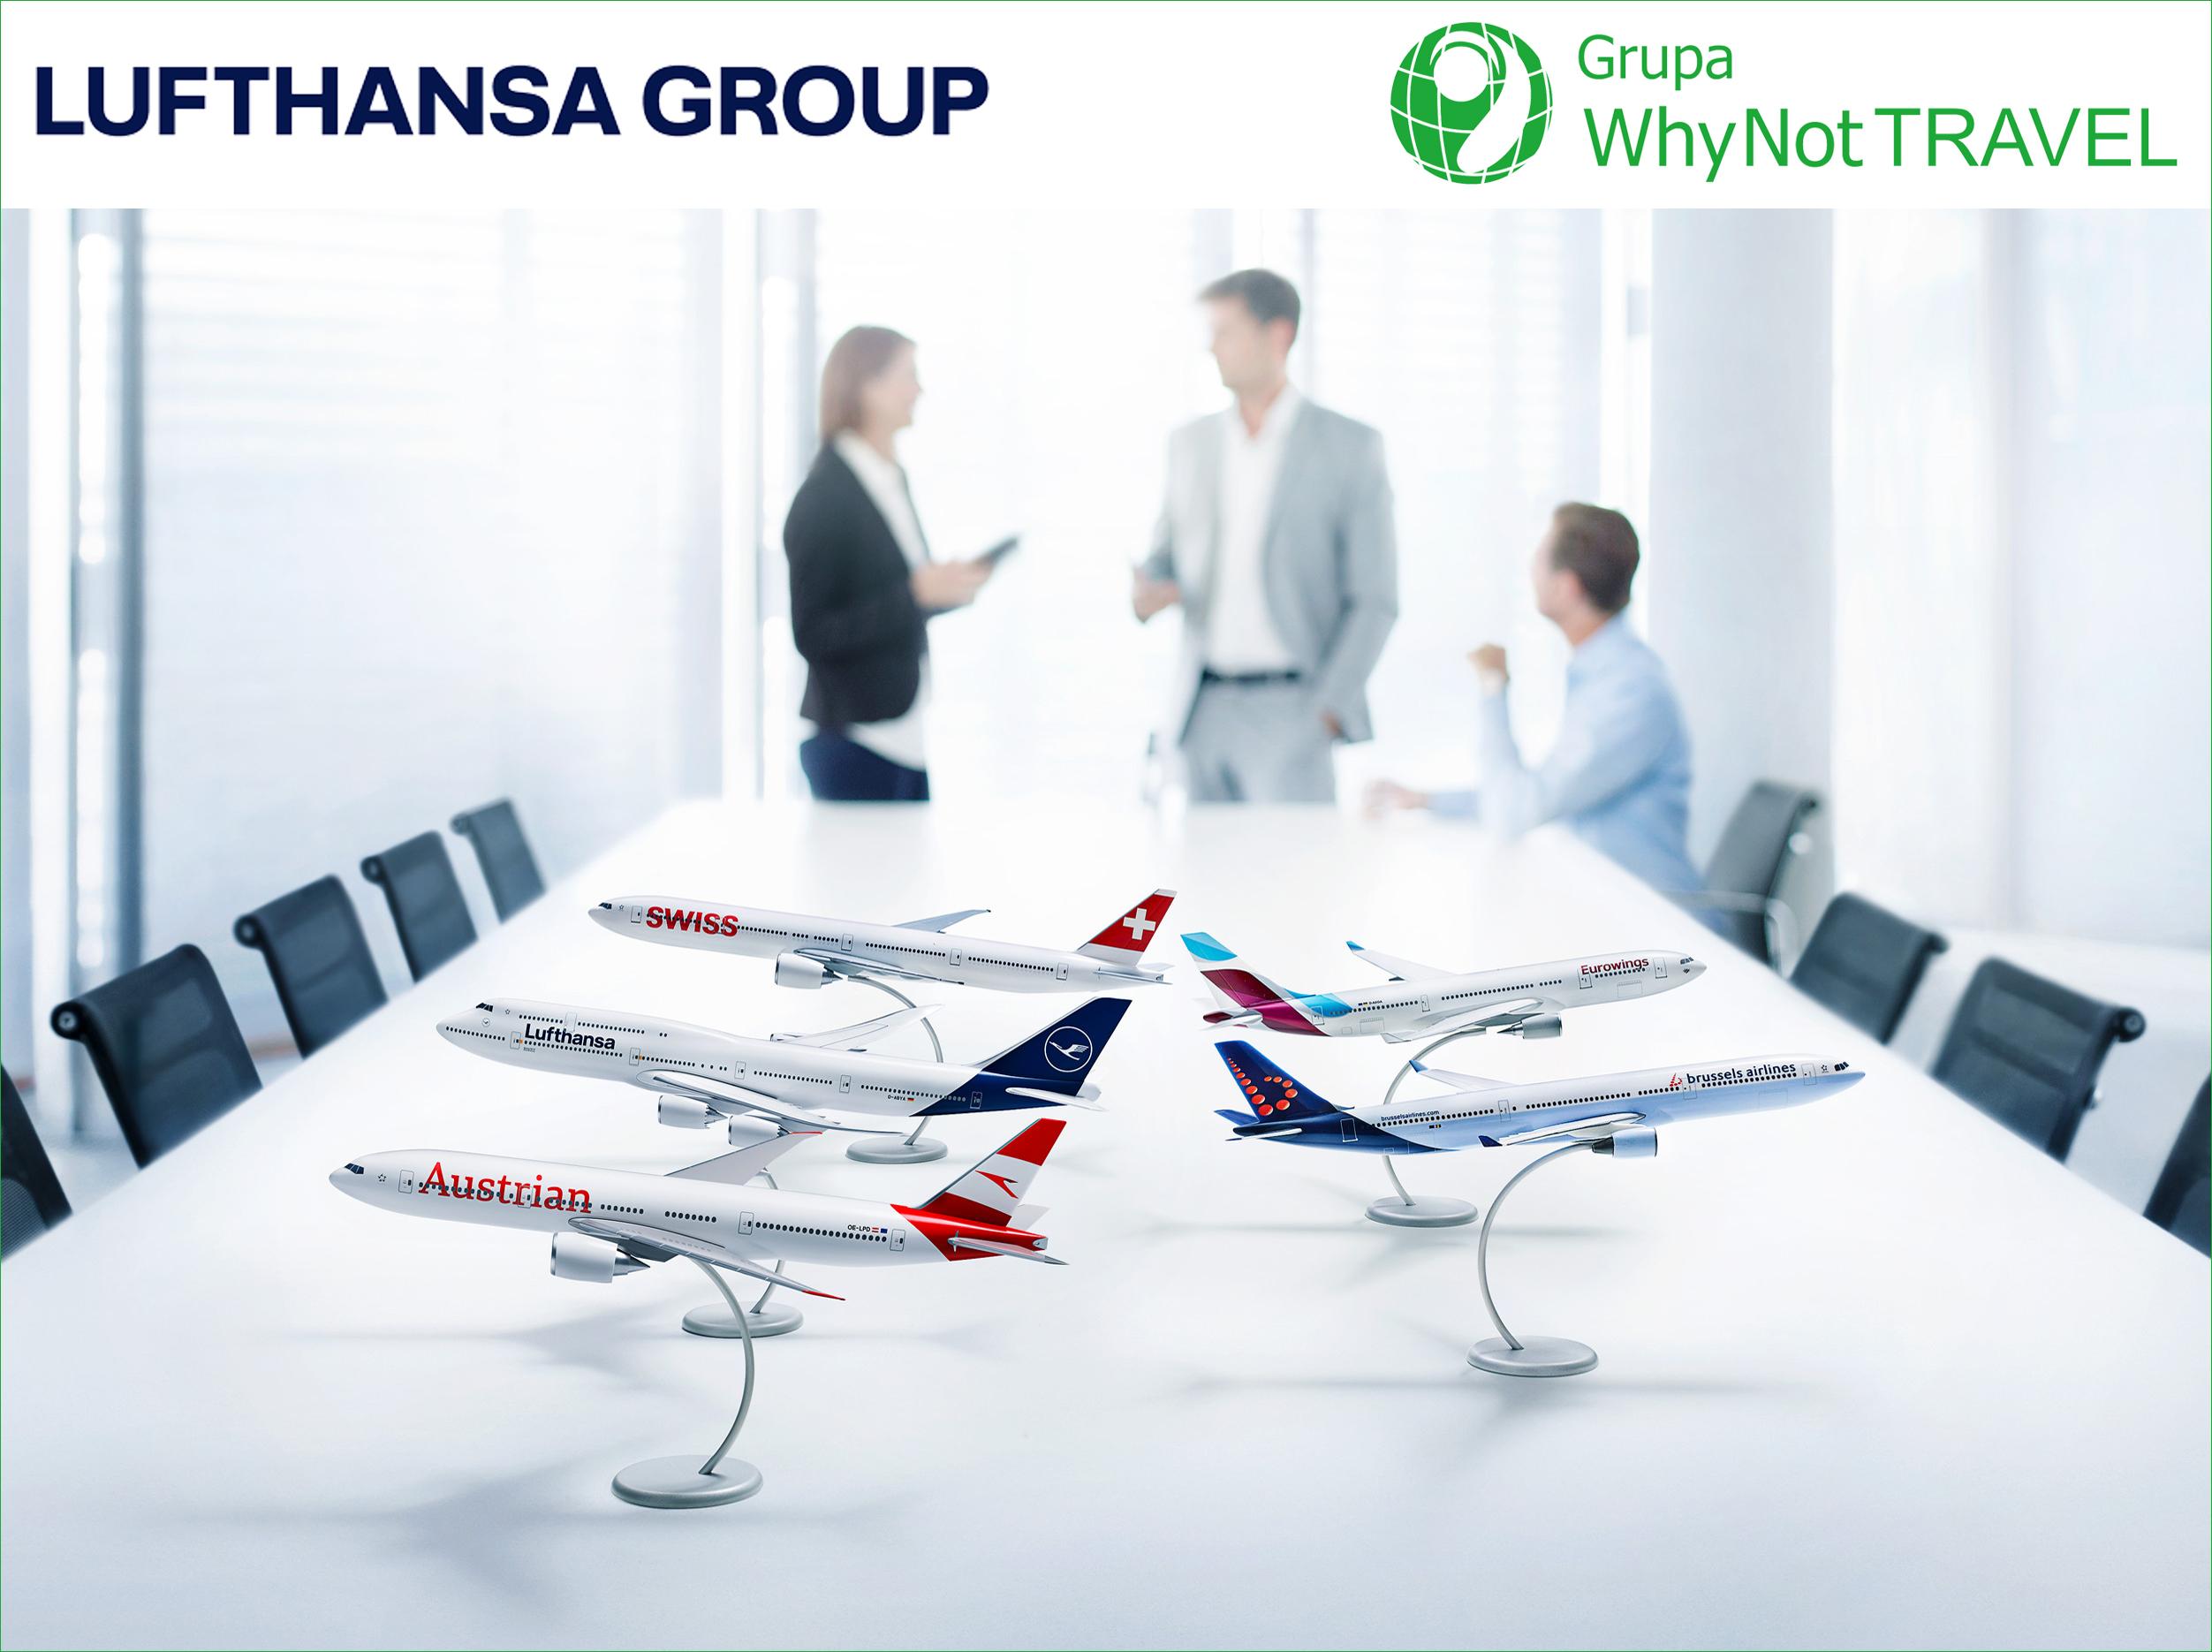 Dobre-informacje-z-Lufthansa-Group